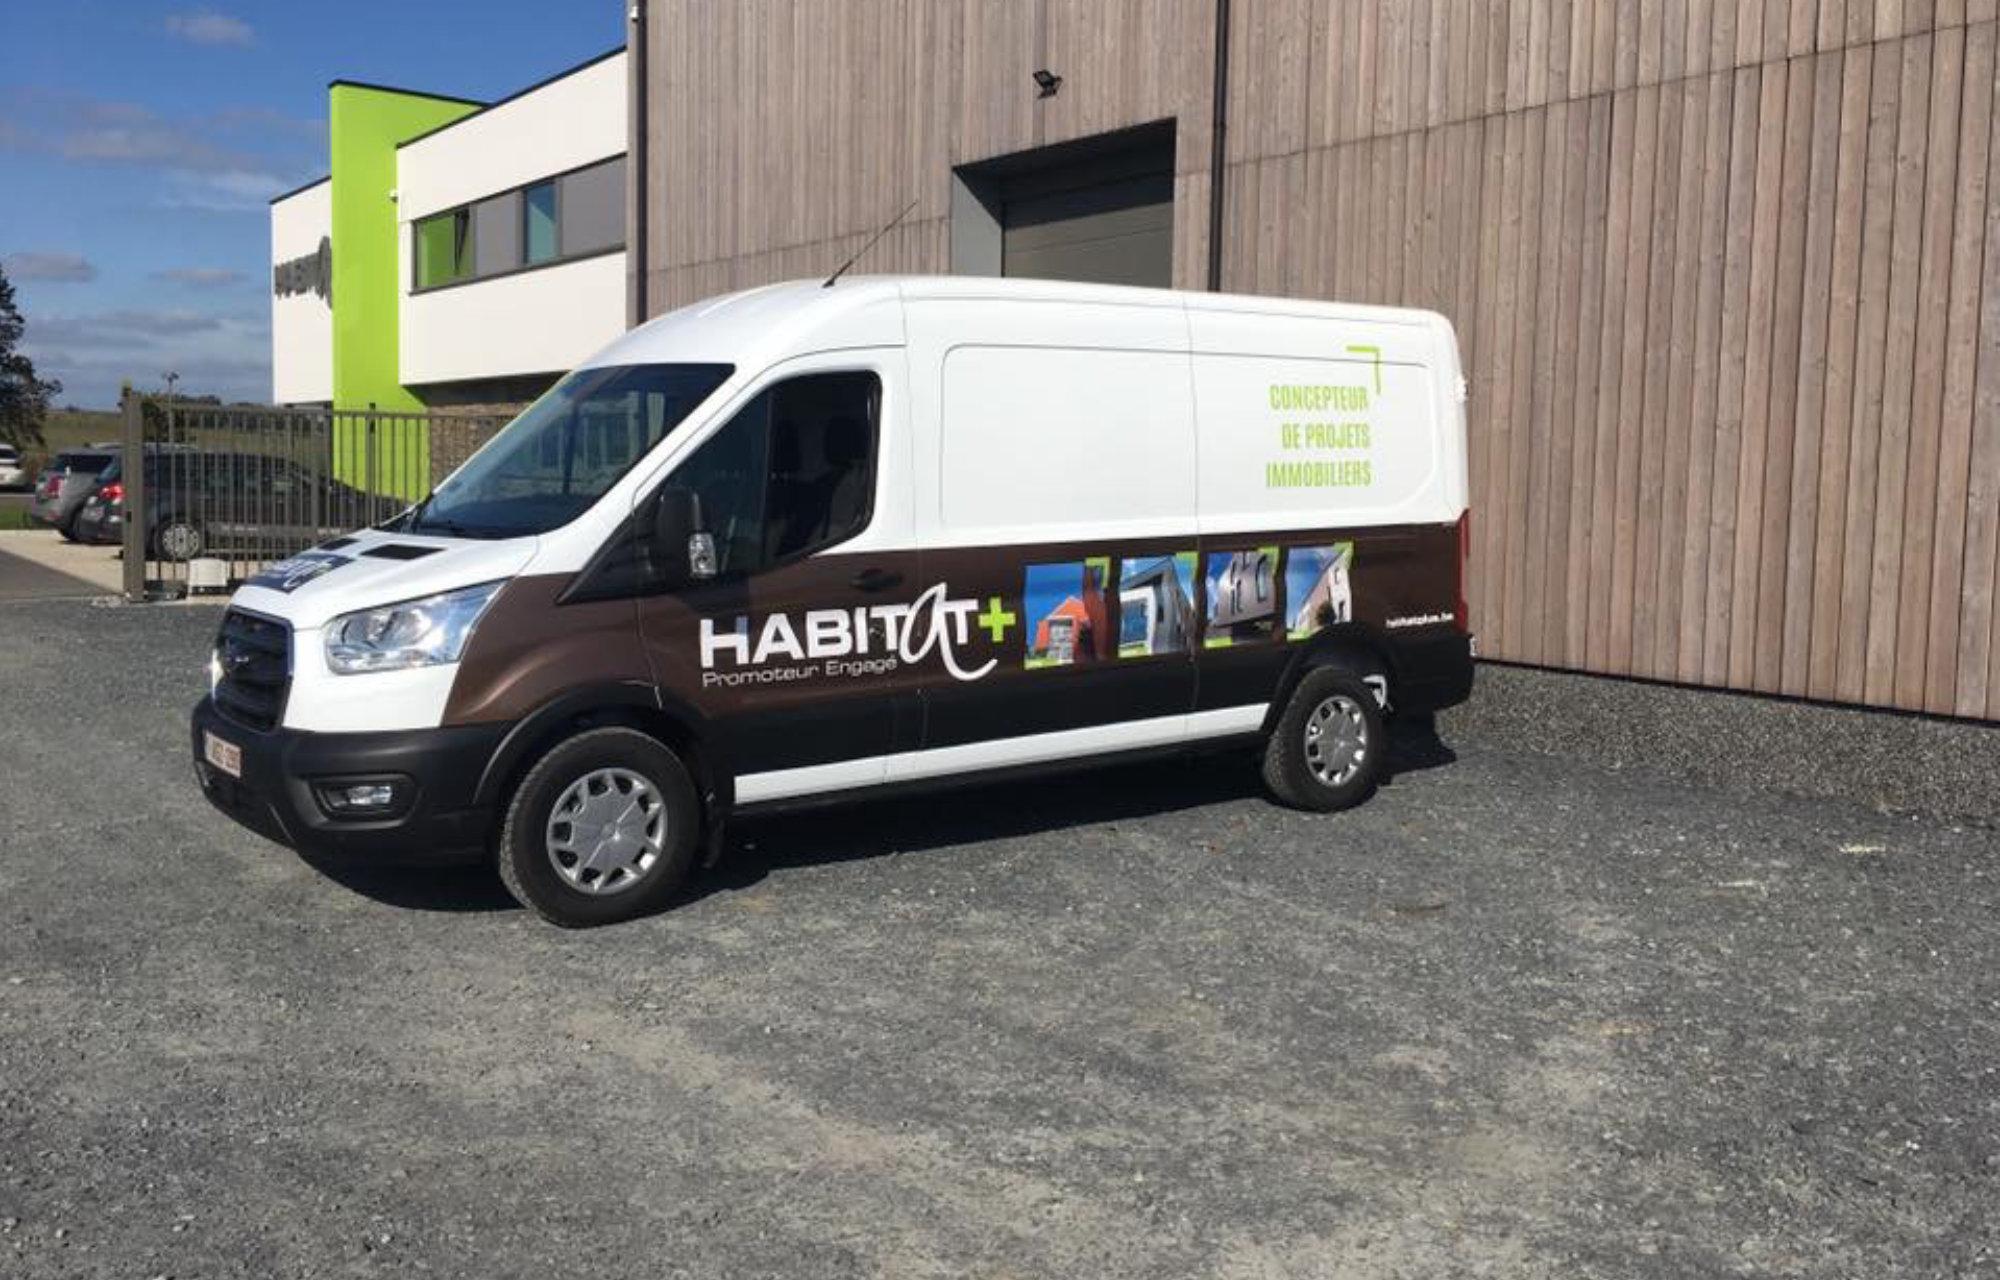 Habitat+